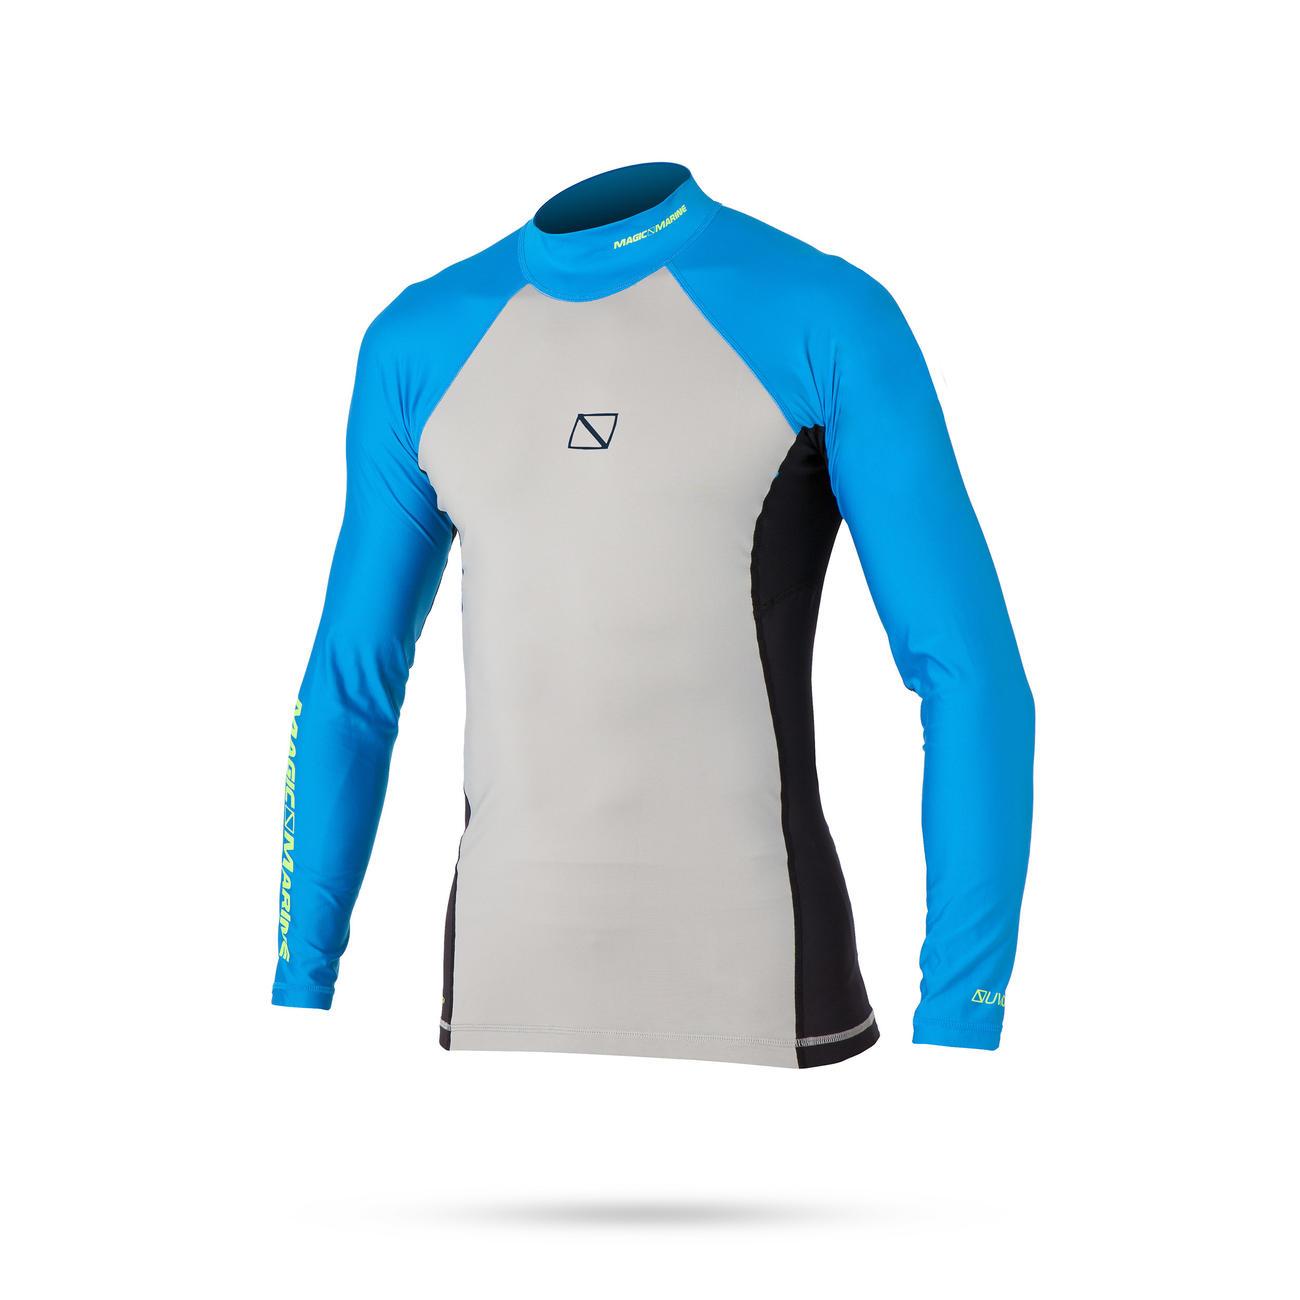 ENERGY RASH VEST L/S Rash vest | unisex ラッシュガード メンズ レディース 長袖 UVカット